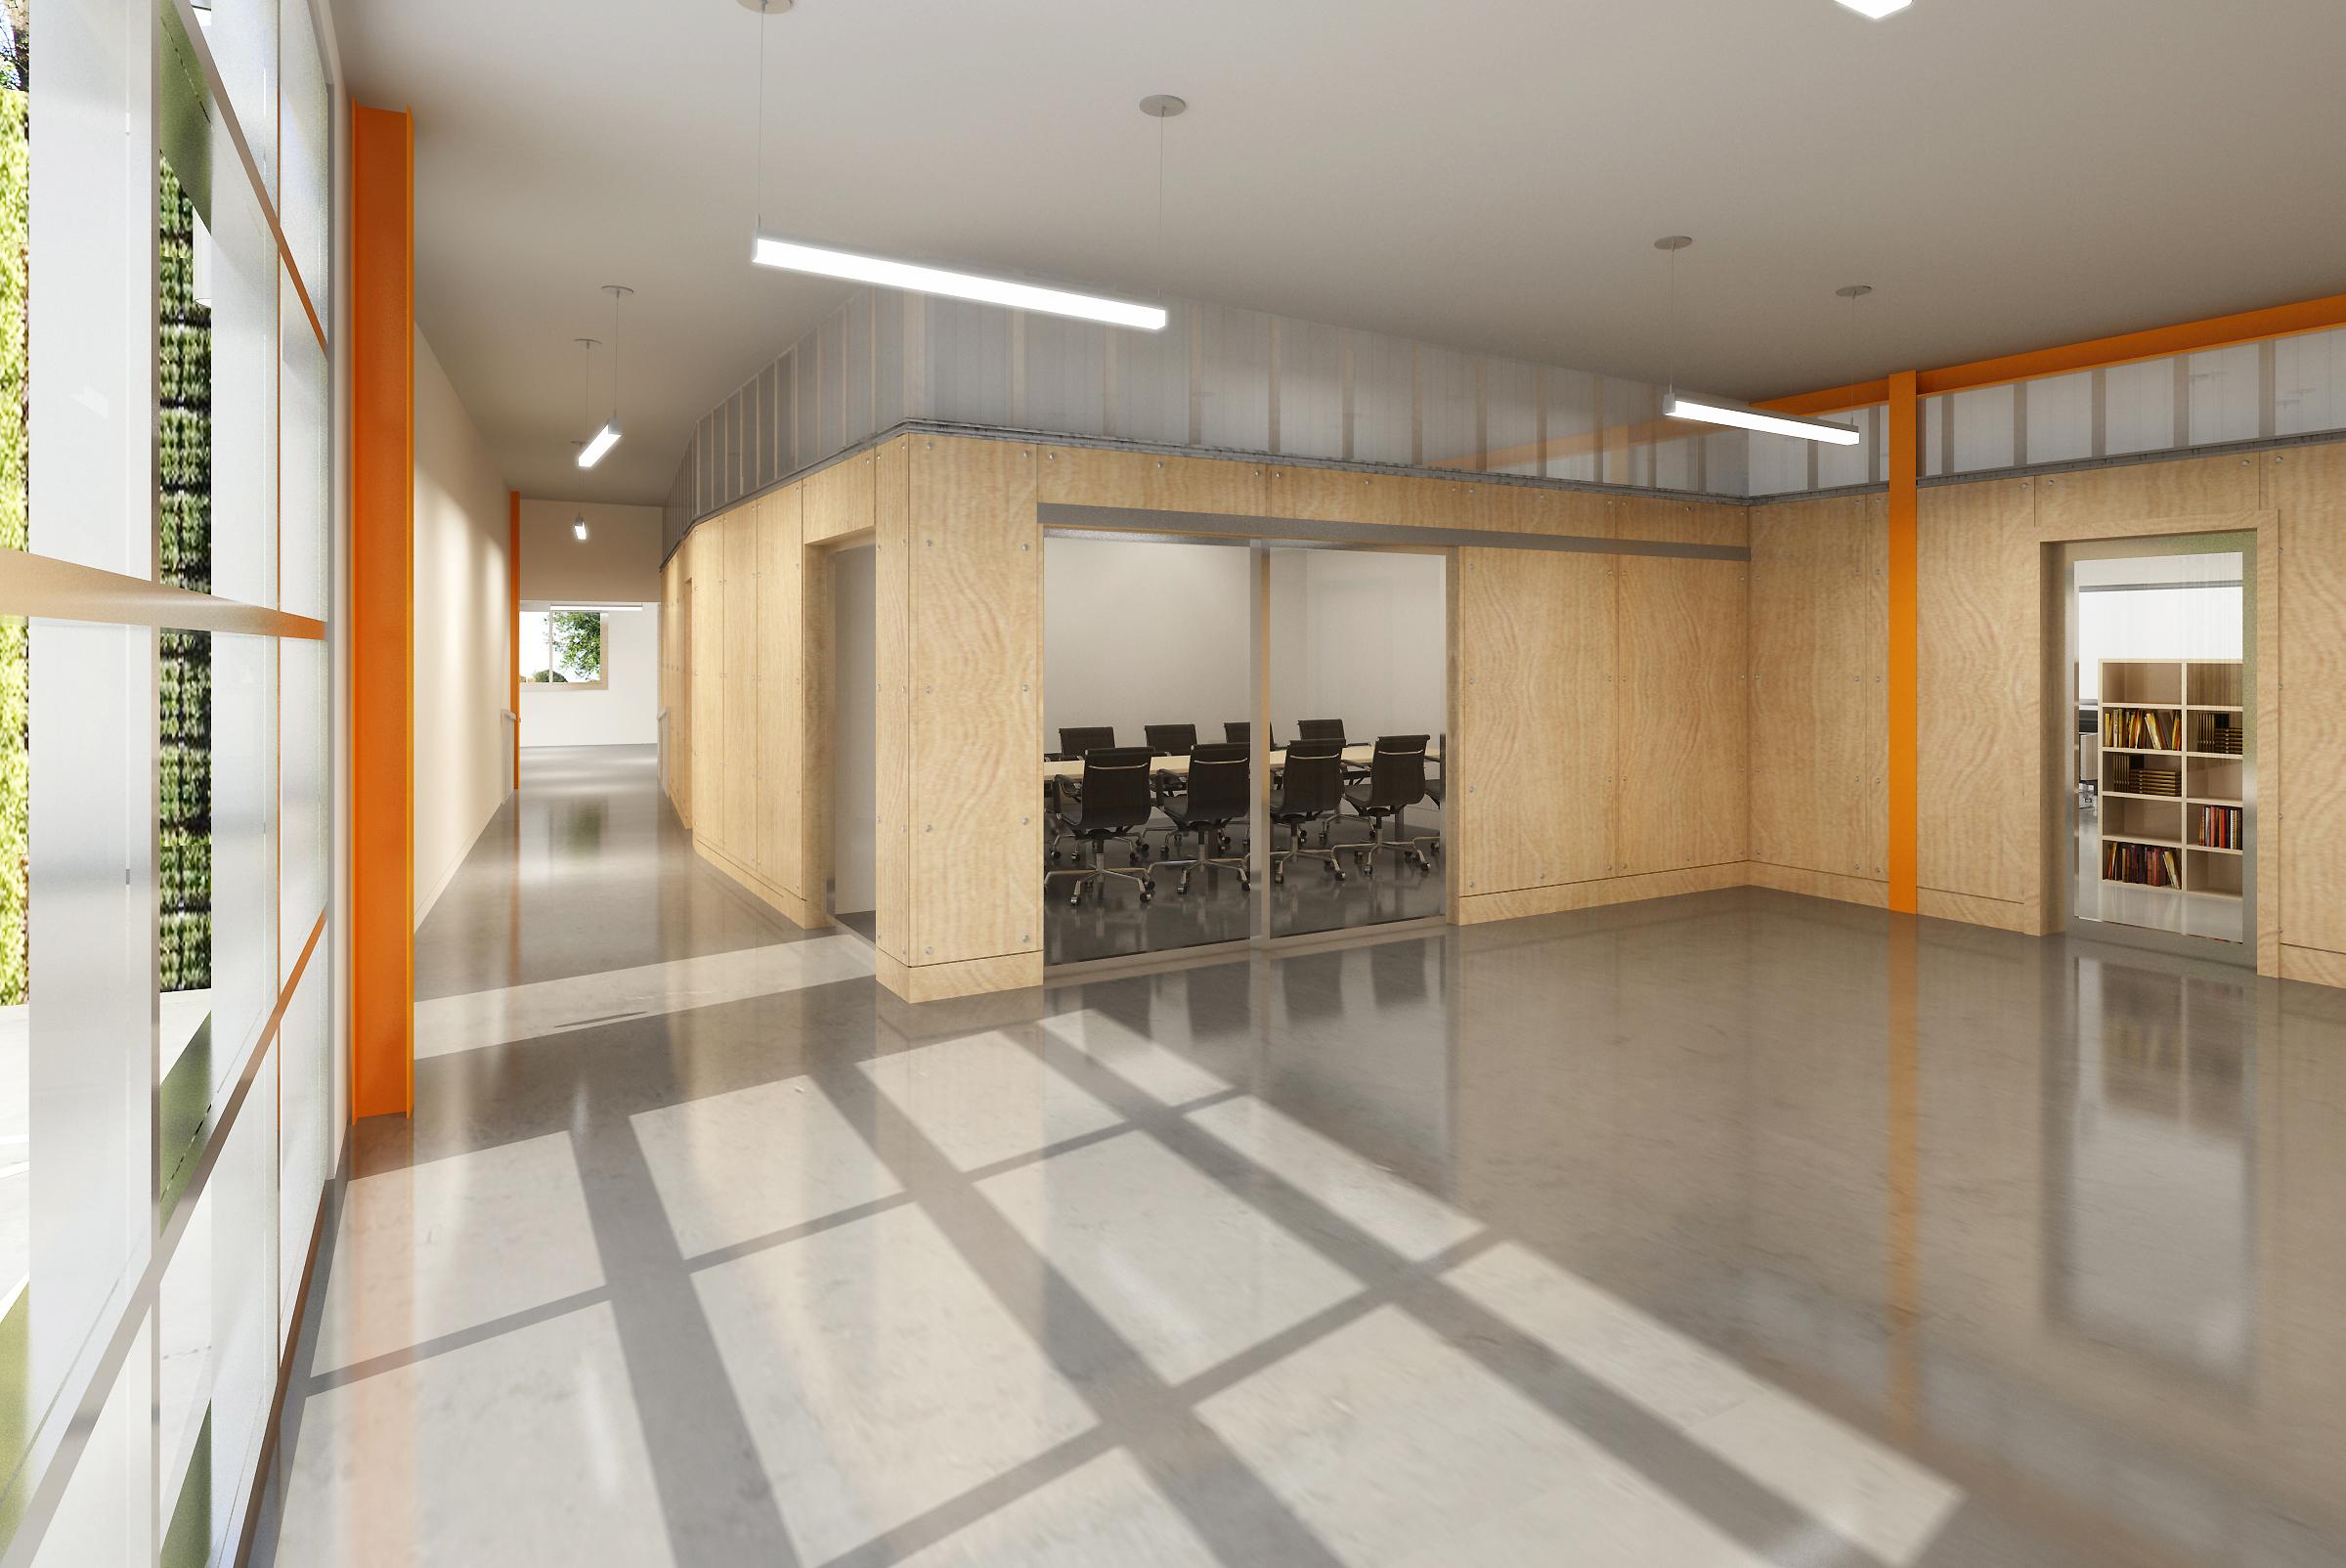 Interior (rendering)